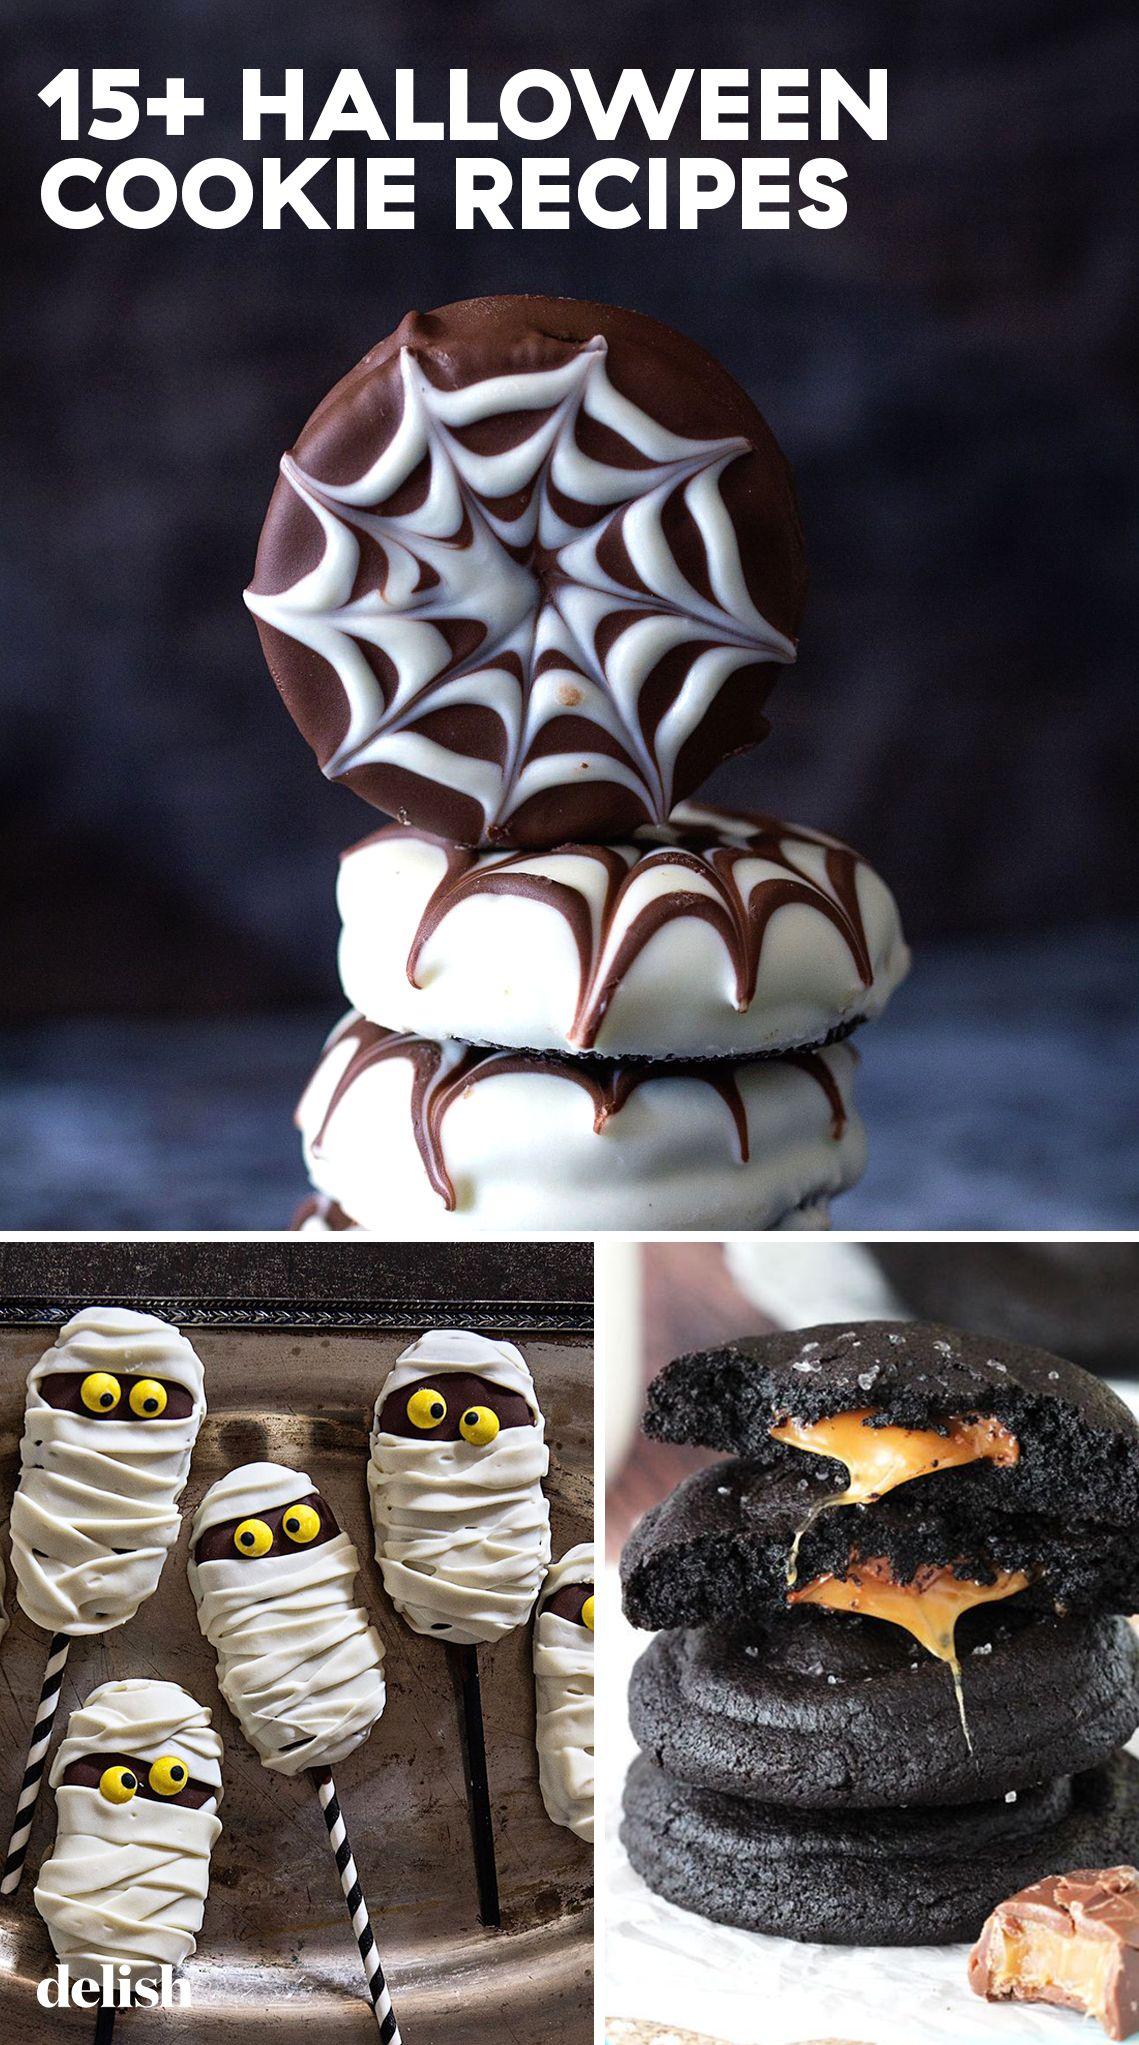 15+ easy halloween cookies - easy recipes & ideas for halloween